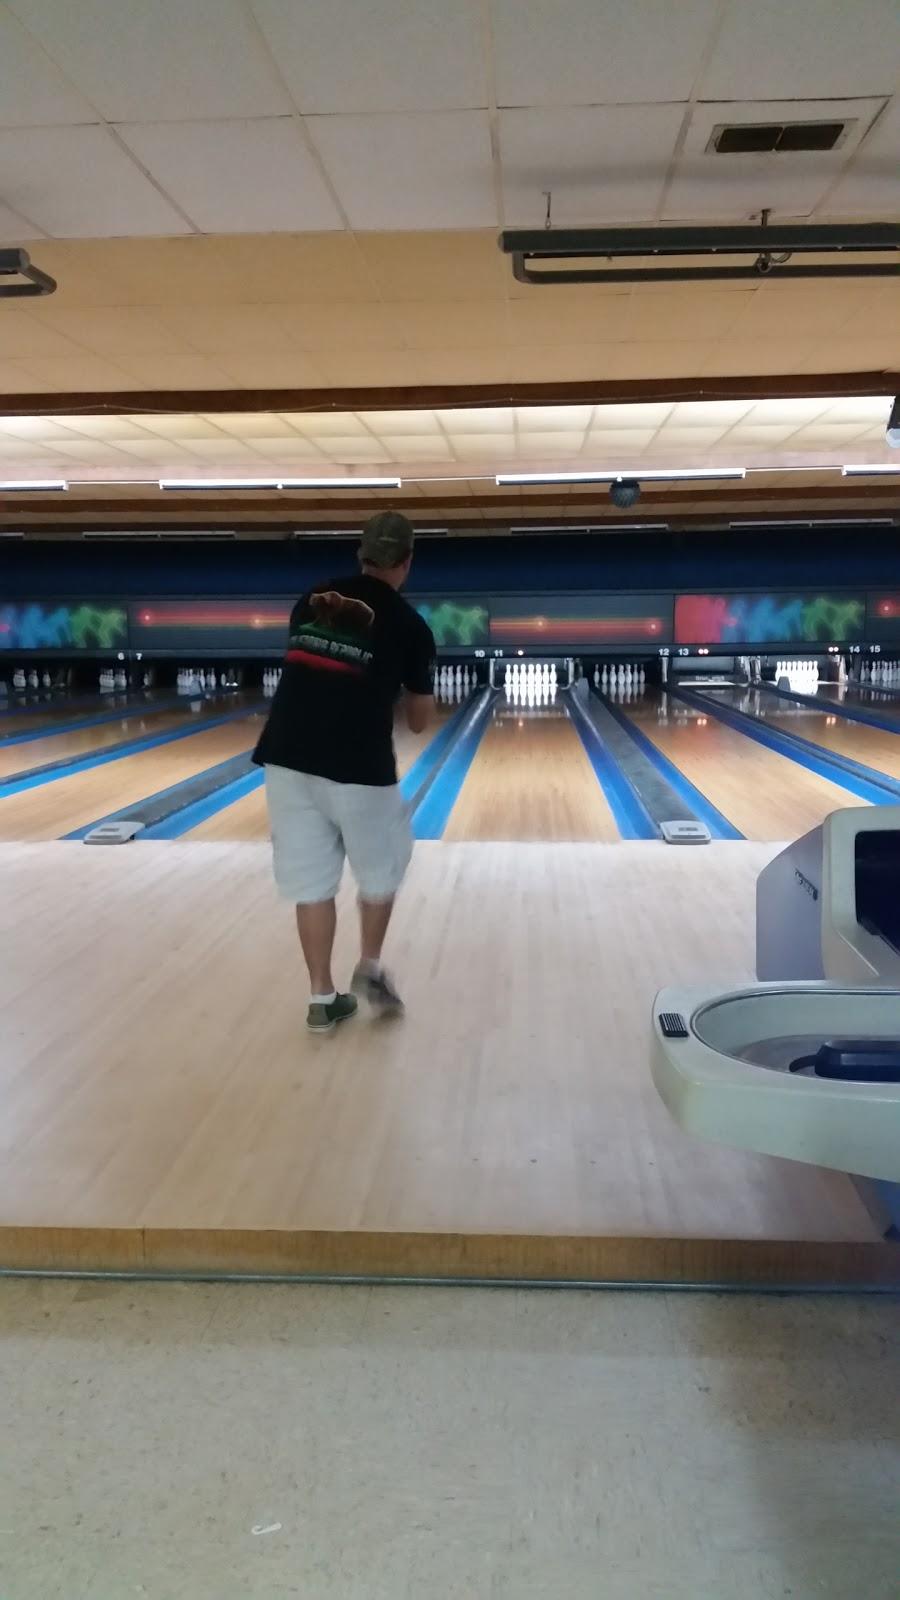 Beaus Billiard Bowling & Arcade - bowling alley  | Photo 3 of 10 | Address: 100 Village Rd, Port Lavaca, TX 77979, USA | Phone: (361) 552-2667